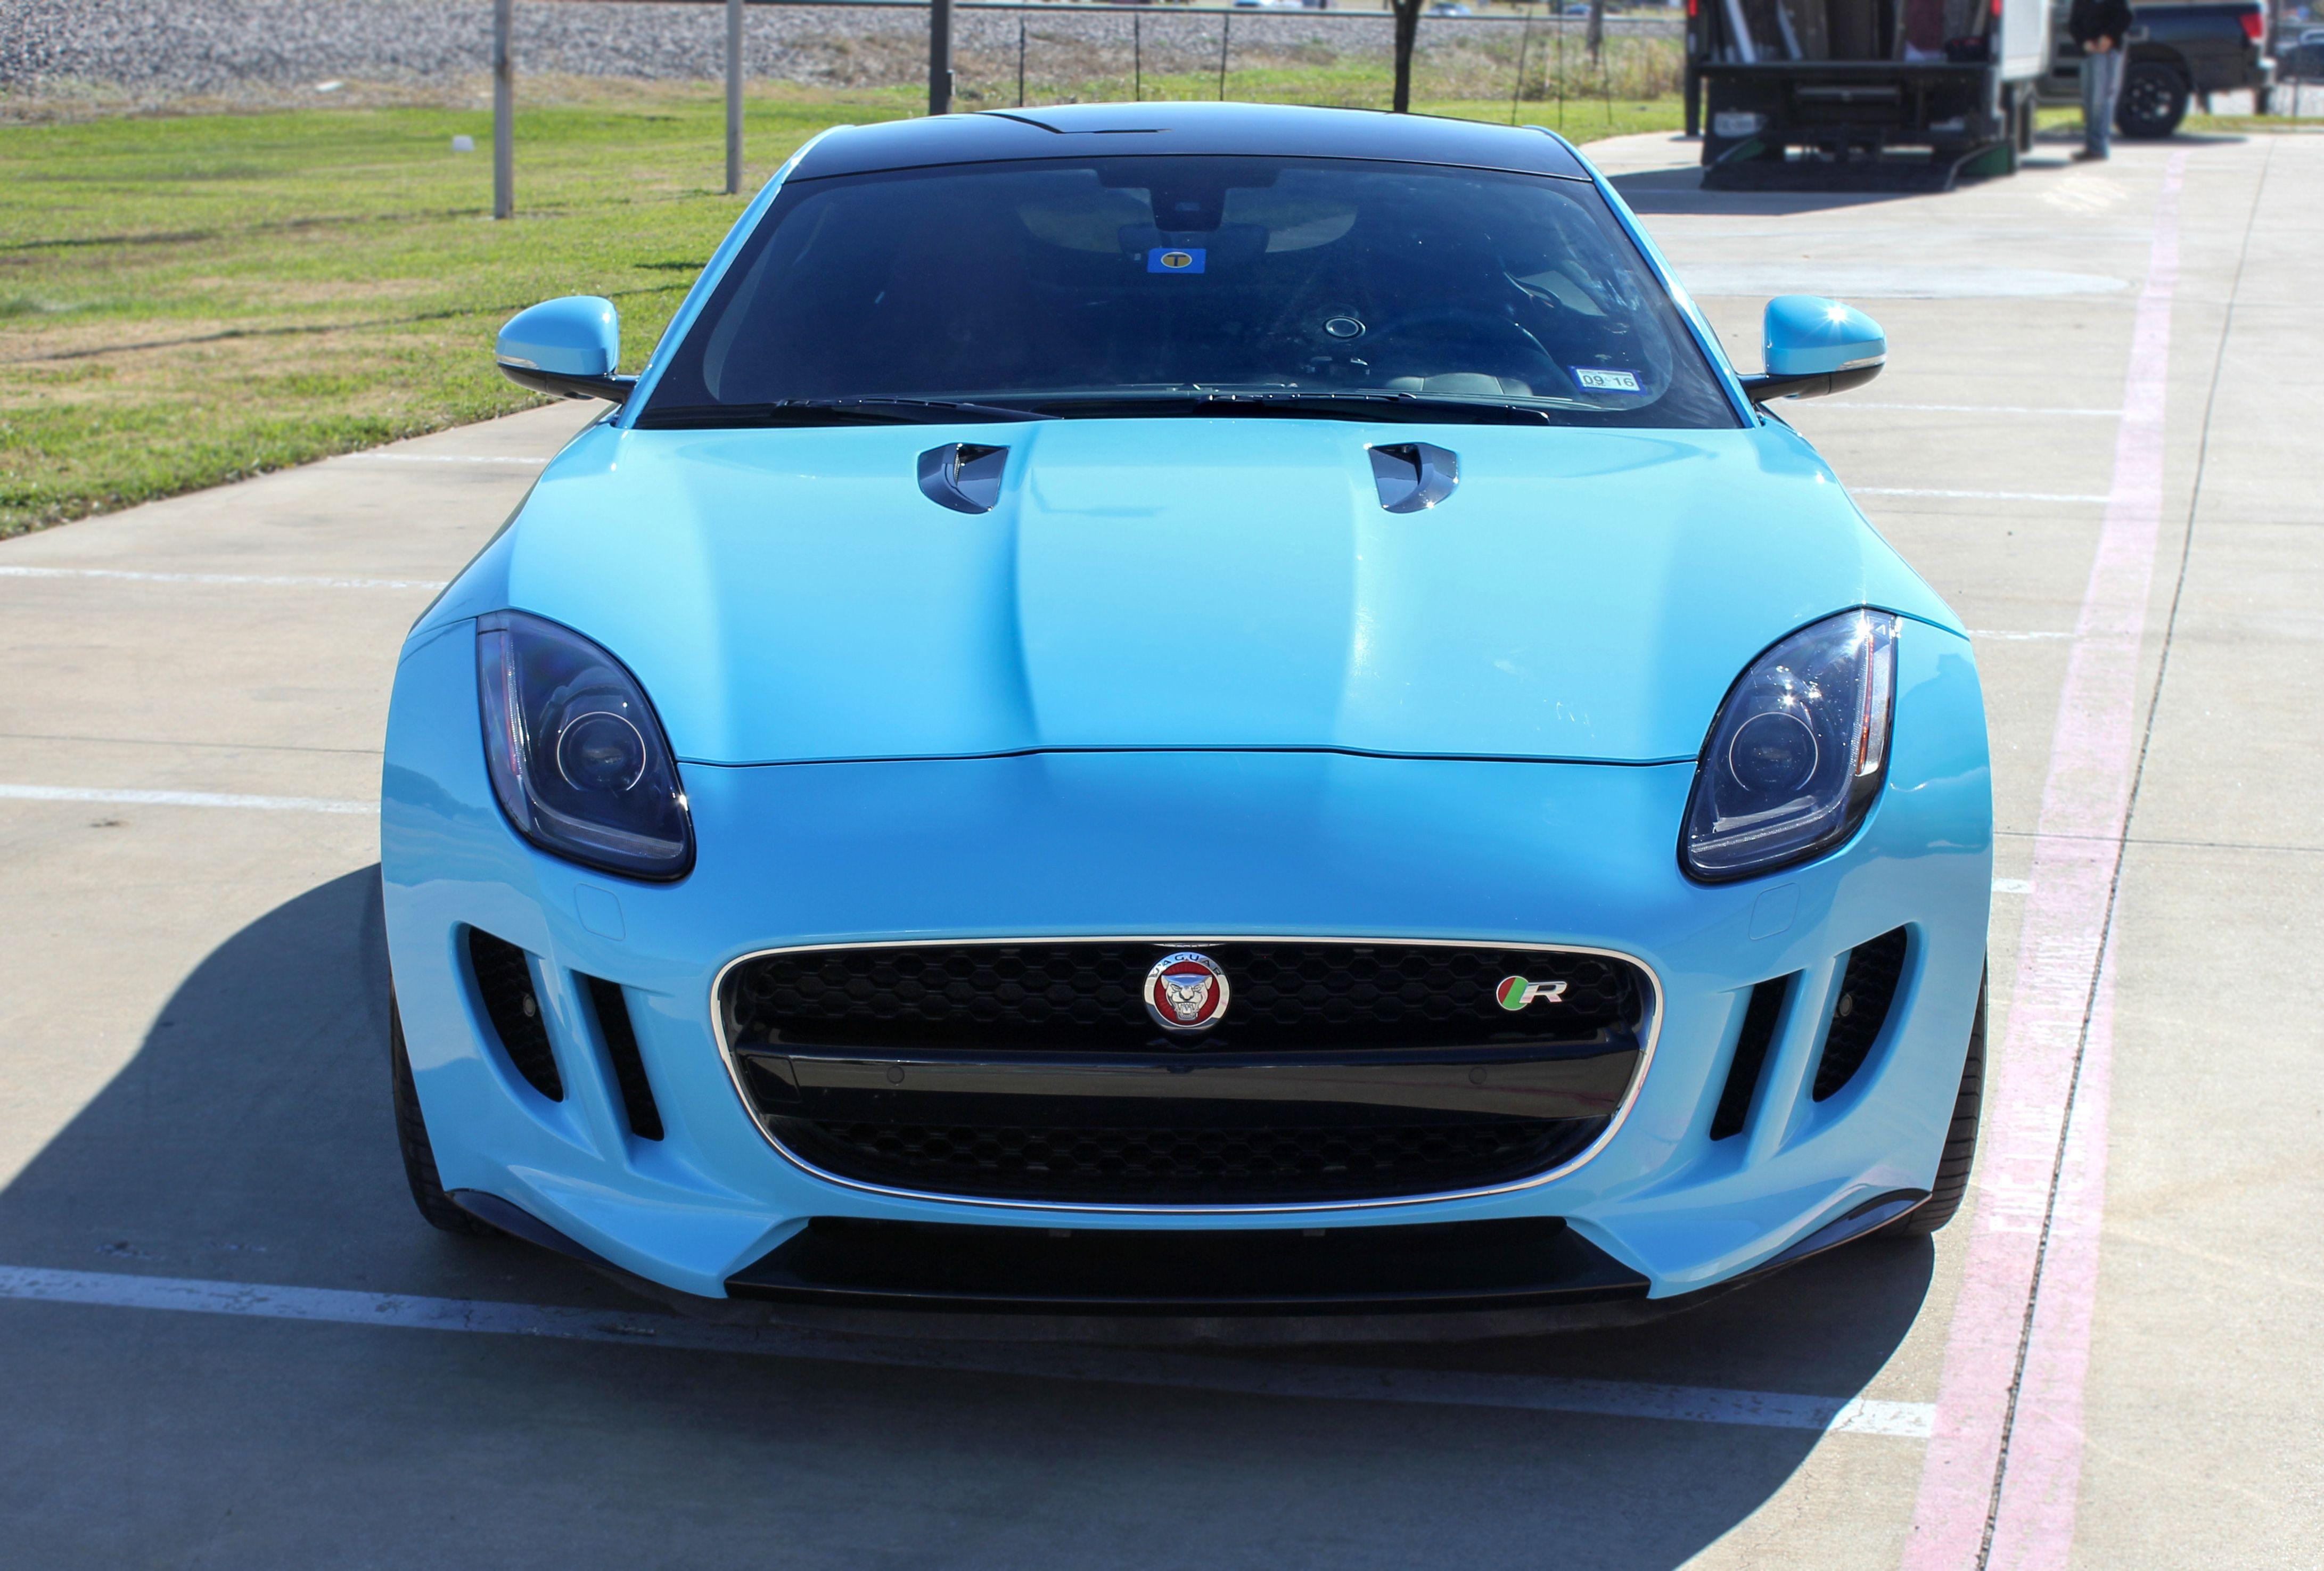 Baby Blue Jaguar Car Wrap Sky Blue Car Wrap Sport Car Wrap Ideas Car Wrap Jaguar Car Jaguar